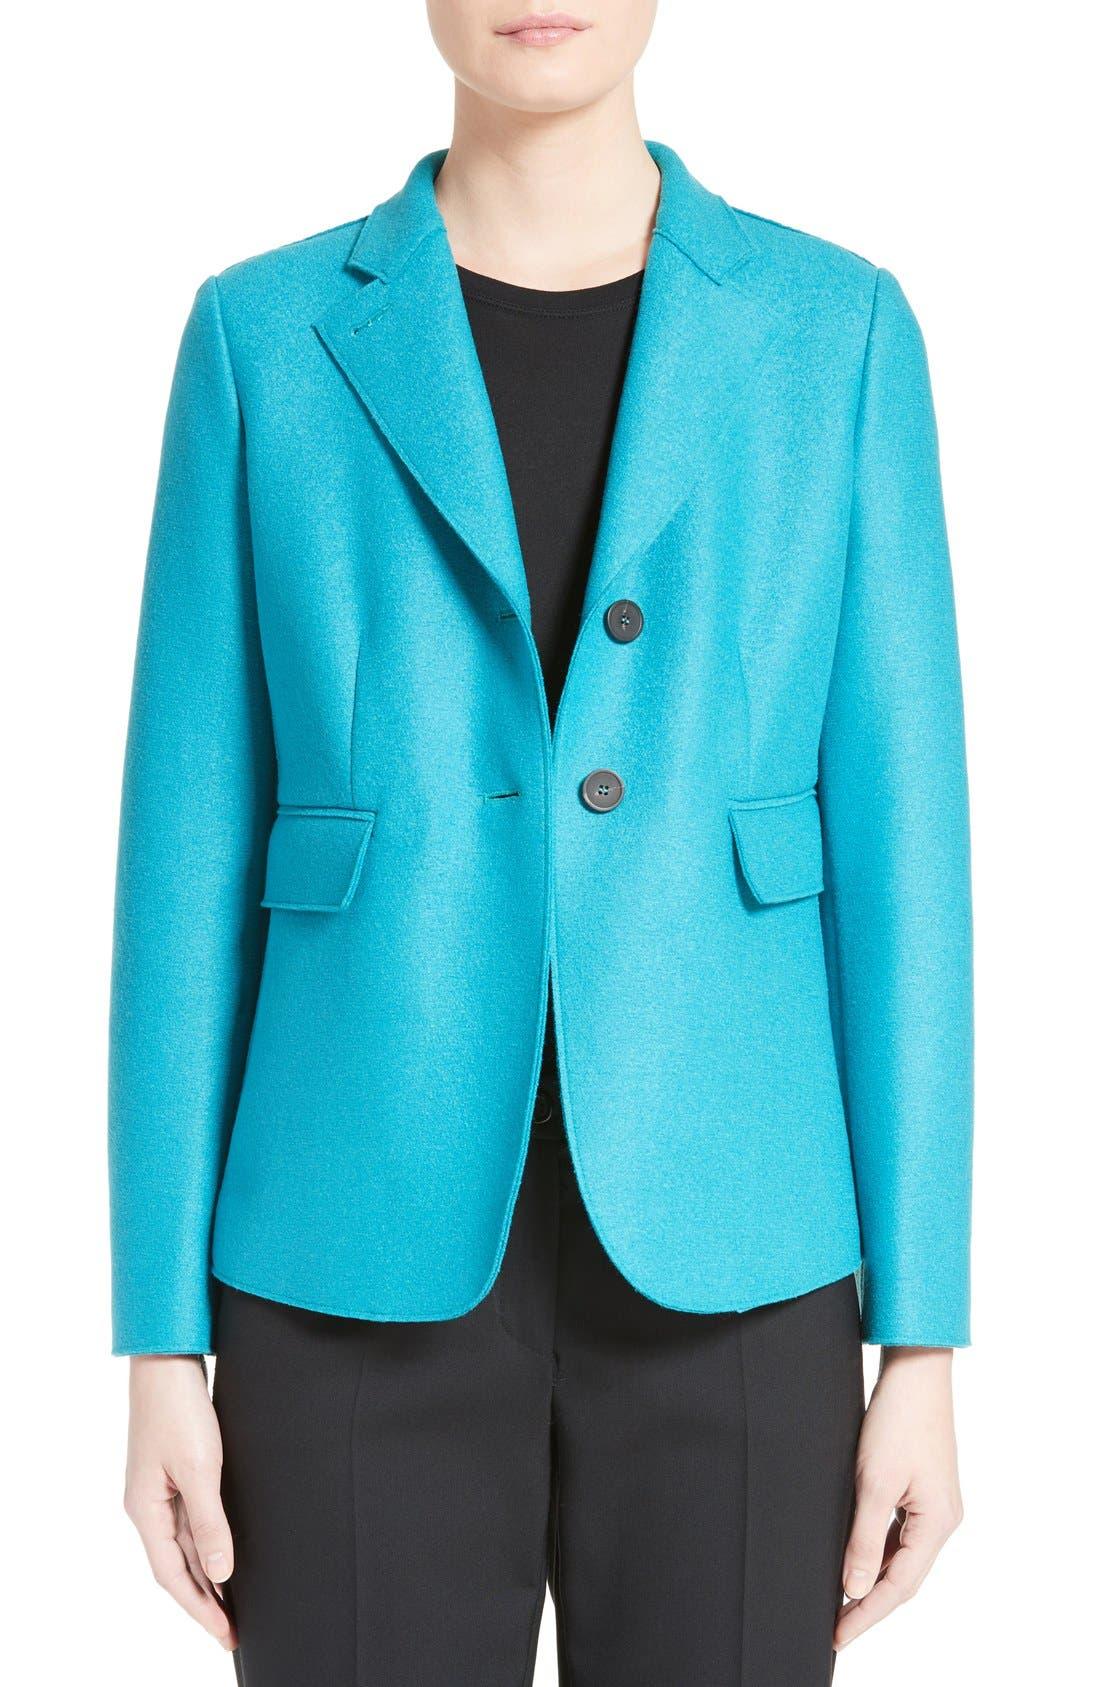 Main Image - Armani Collezioni Double Face Wool Jacket